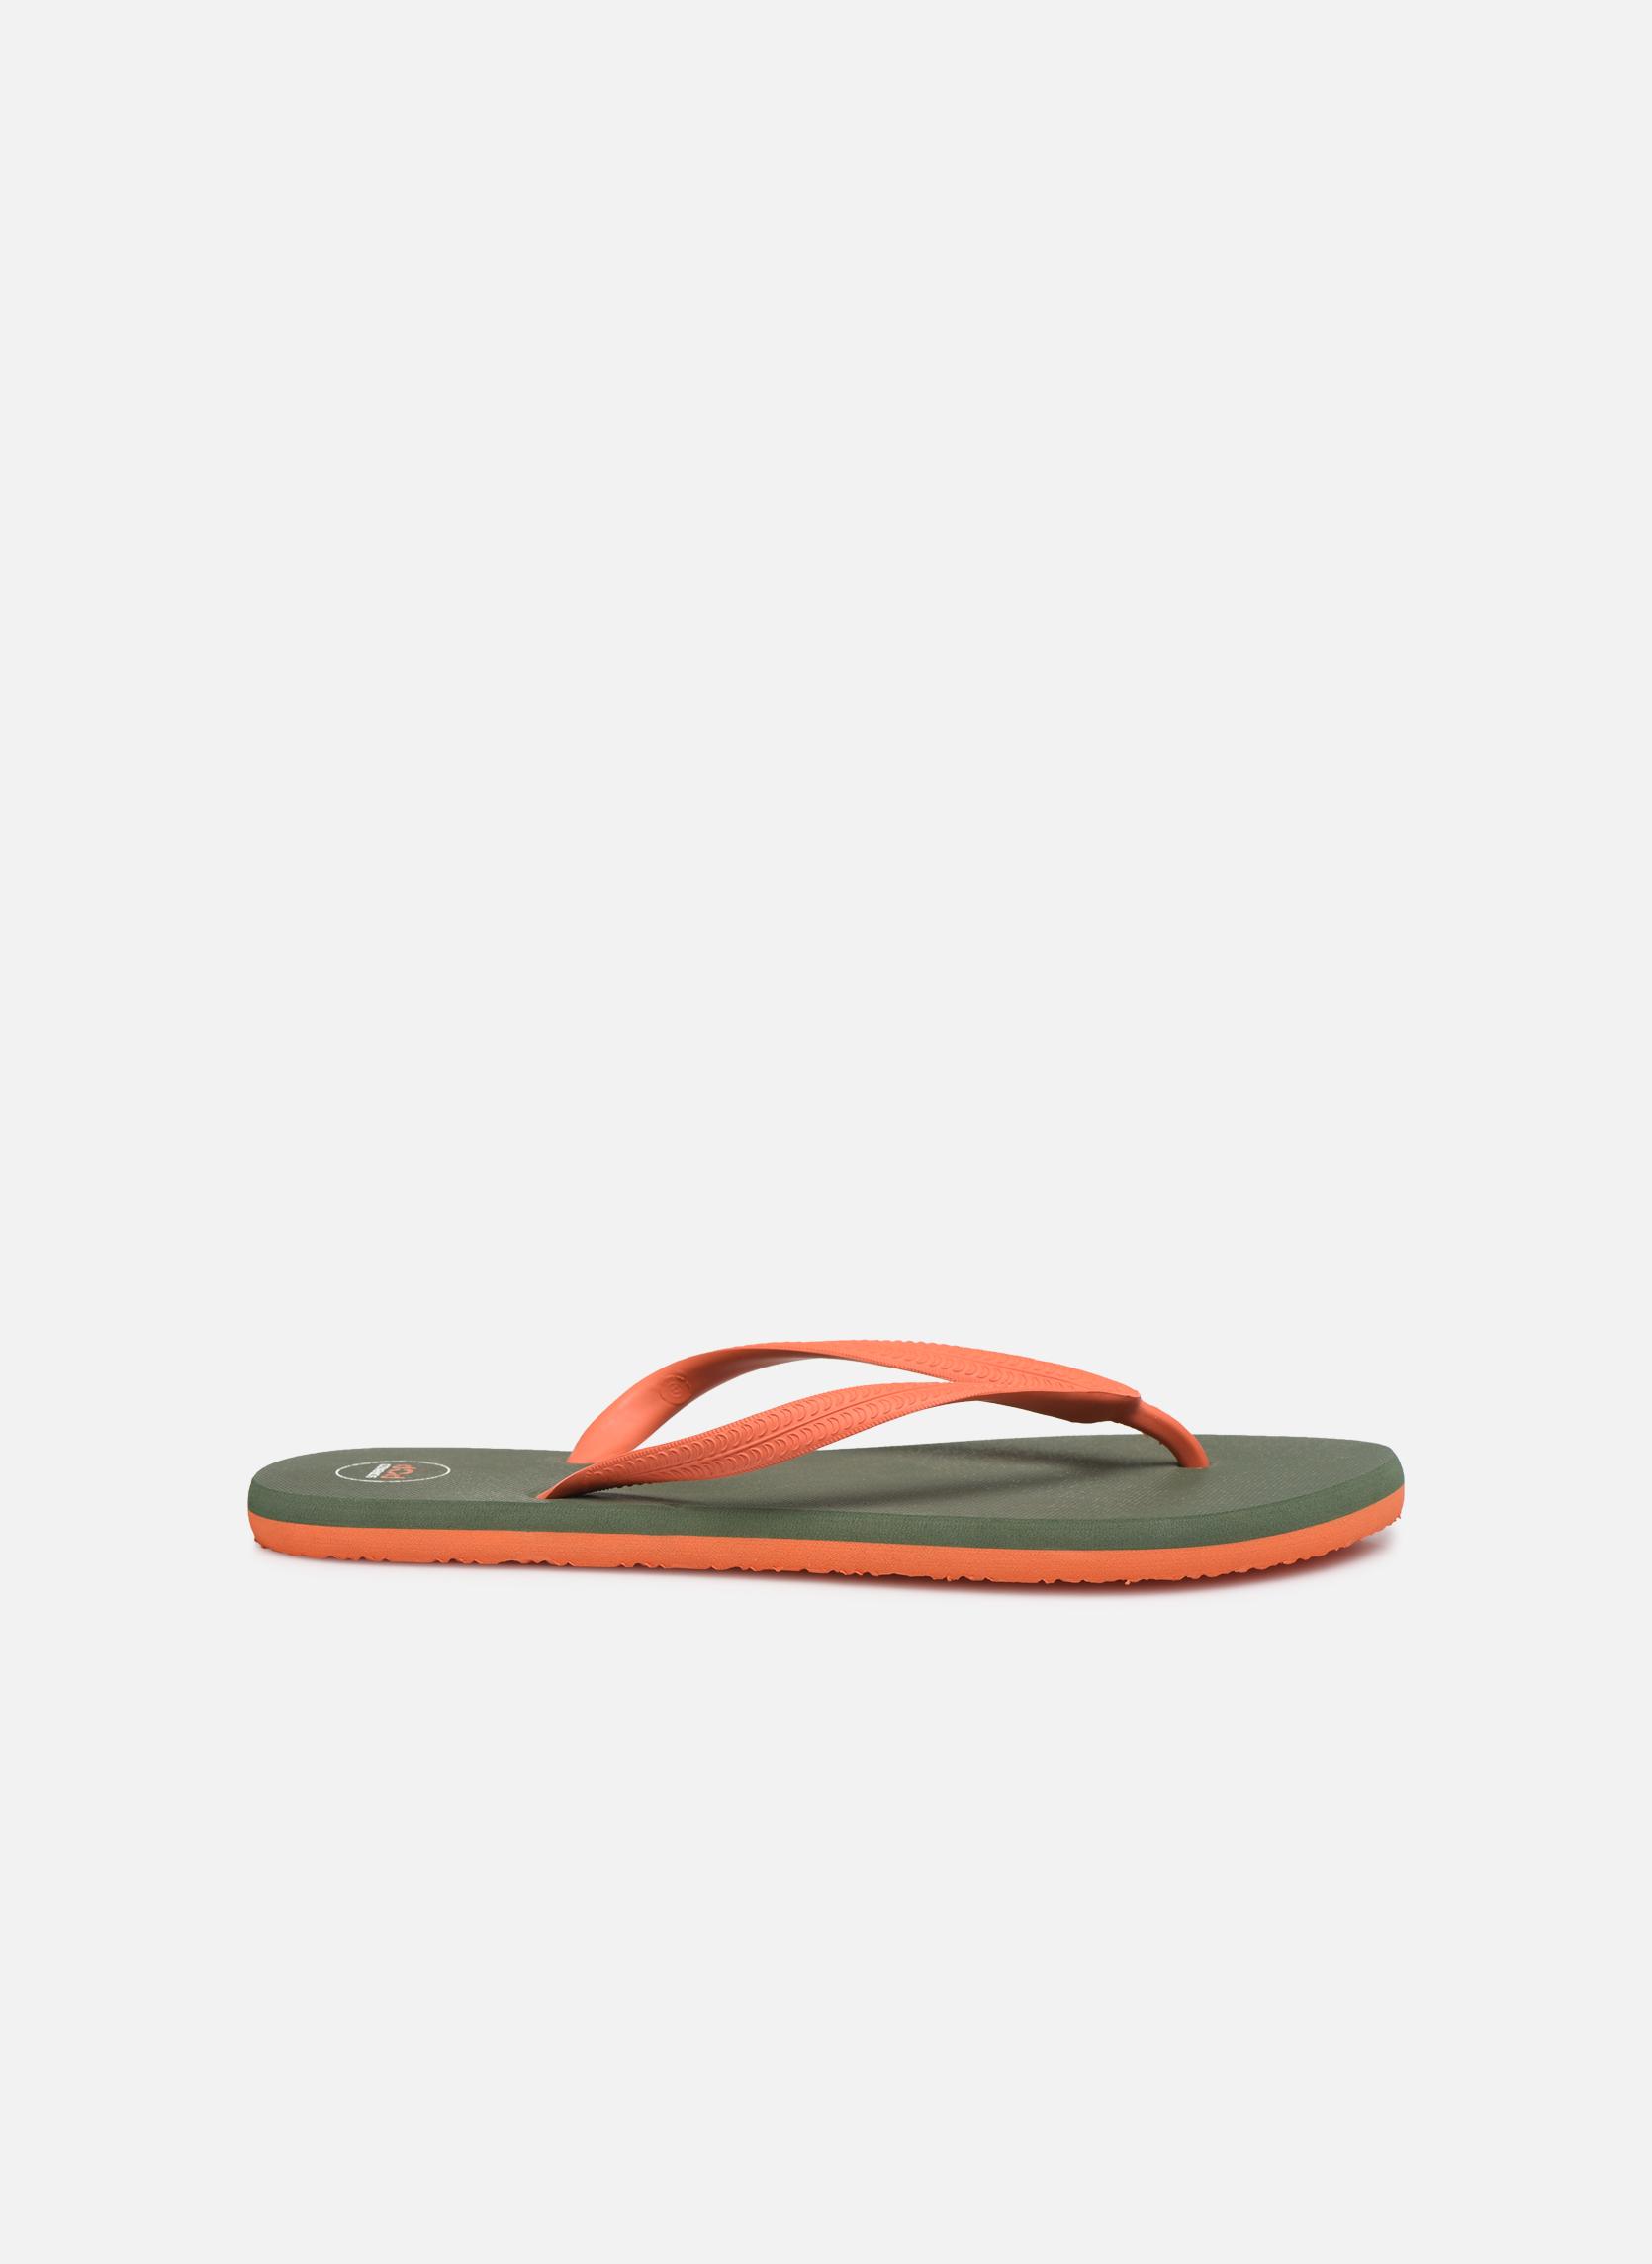 Diya M Tong  Flip Flop Orange /kaki 5925